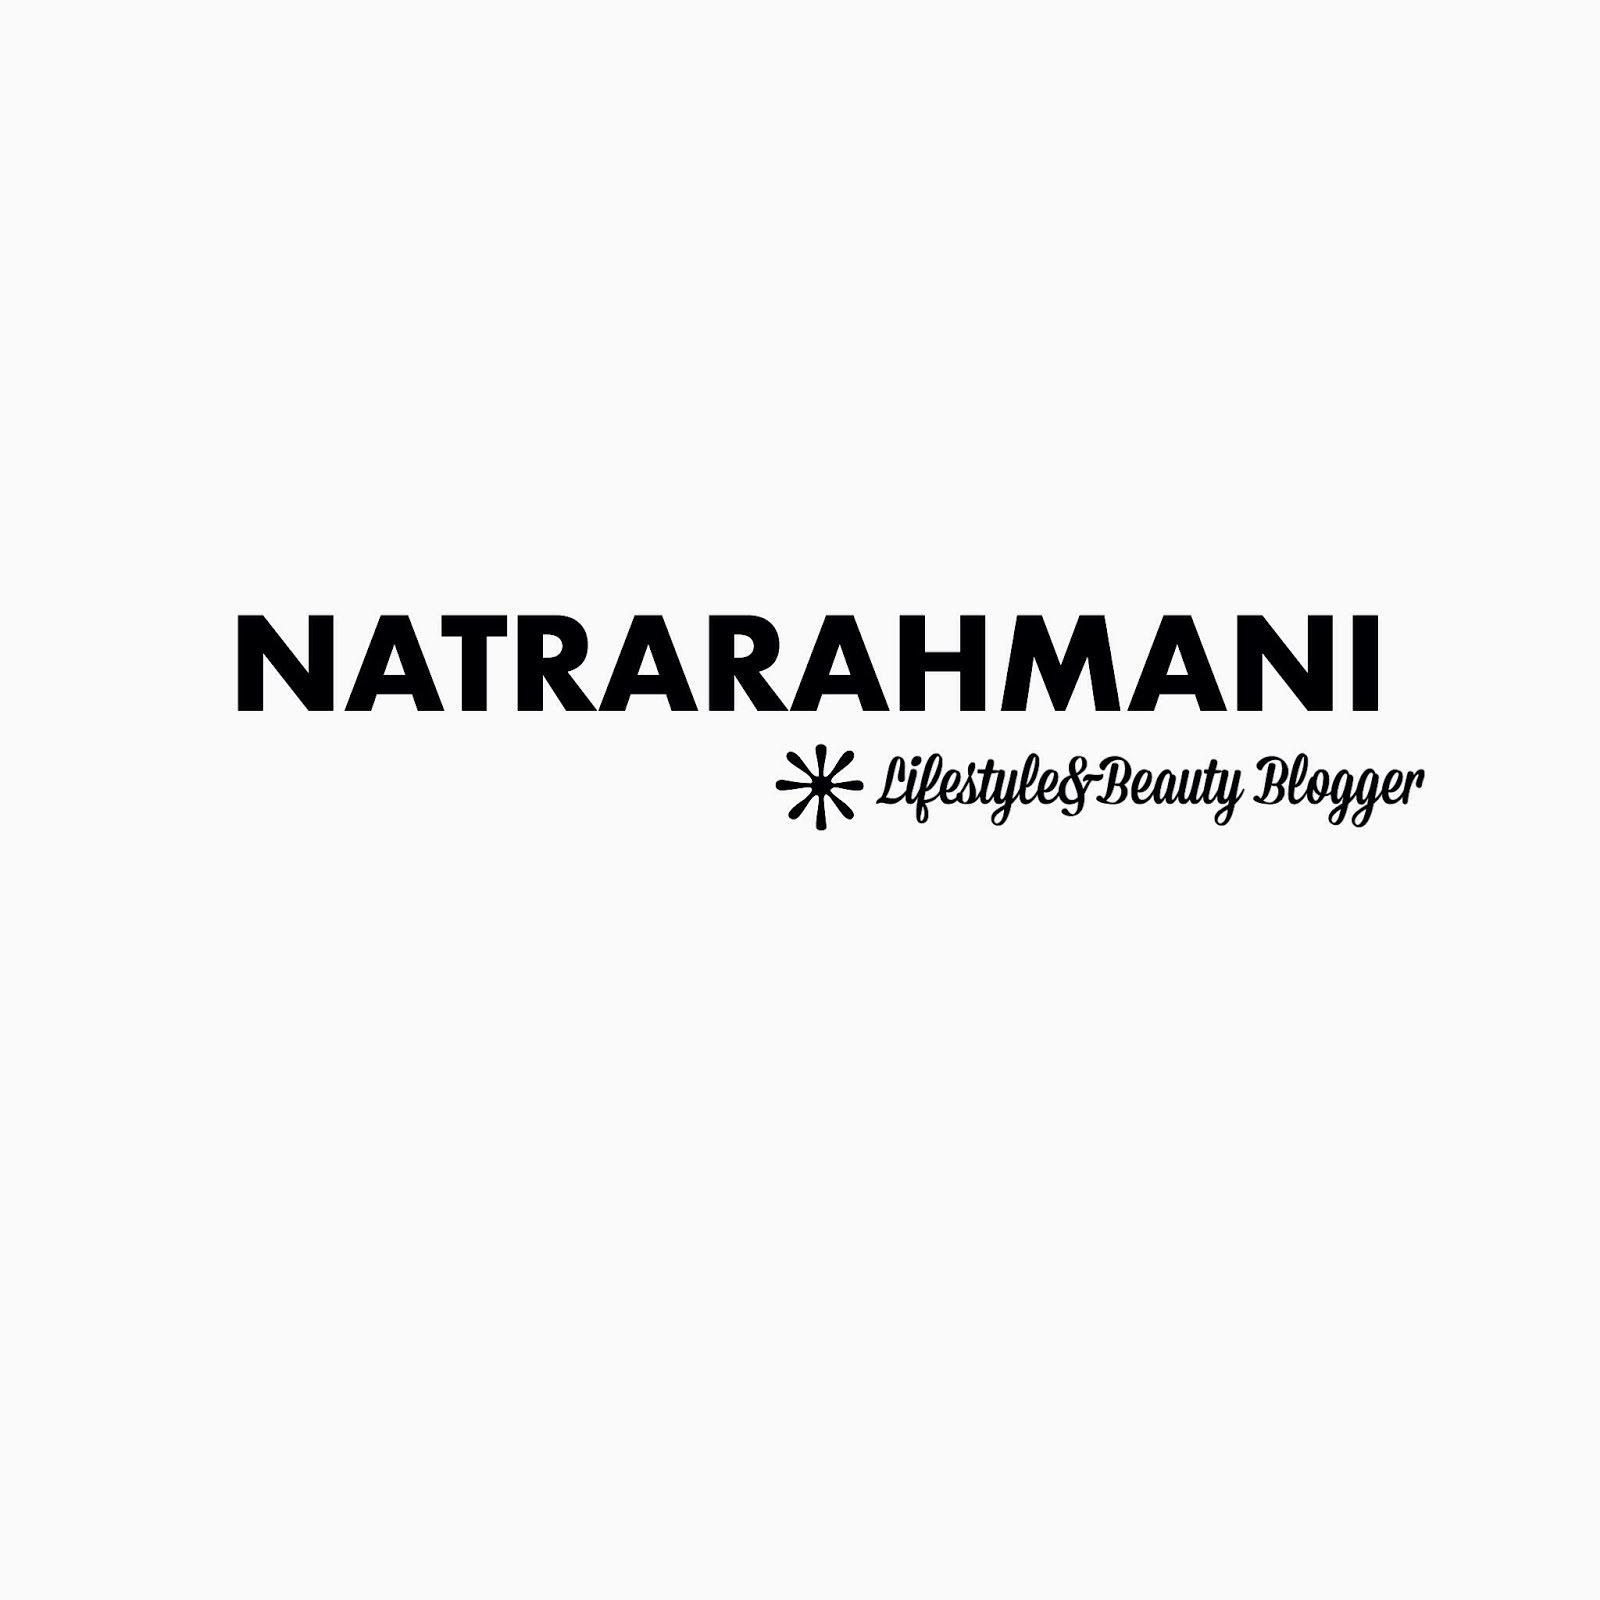 Natrarahmani